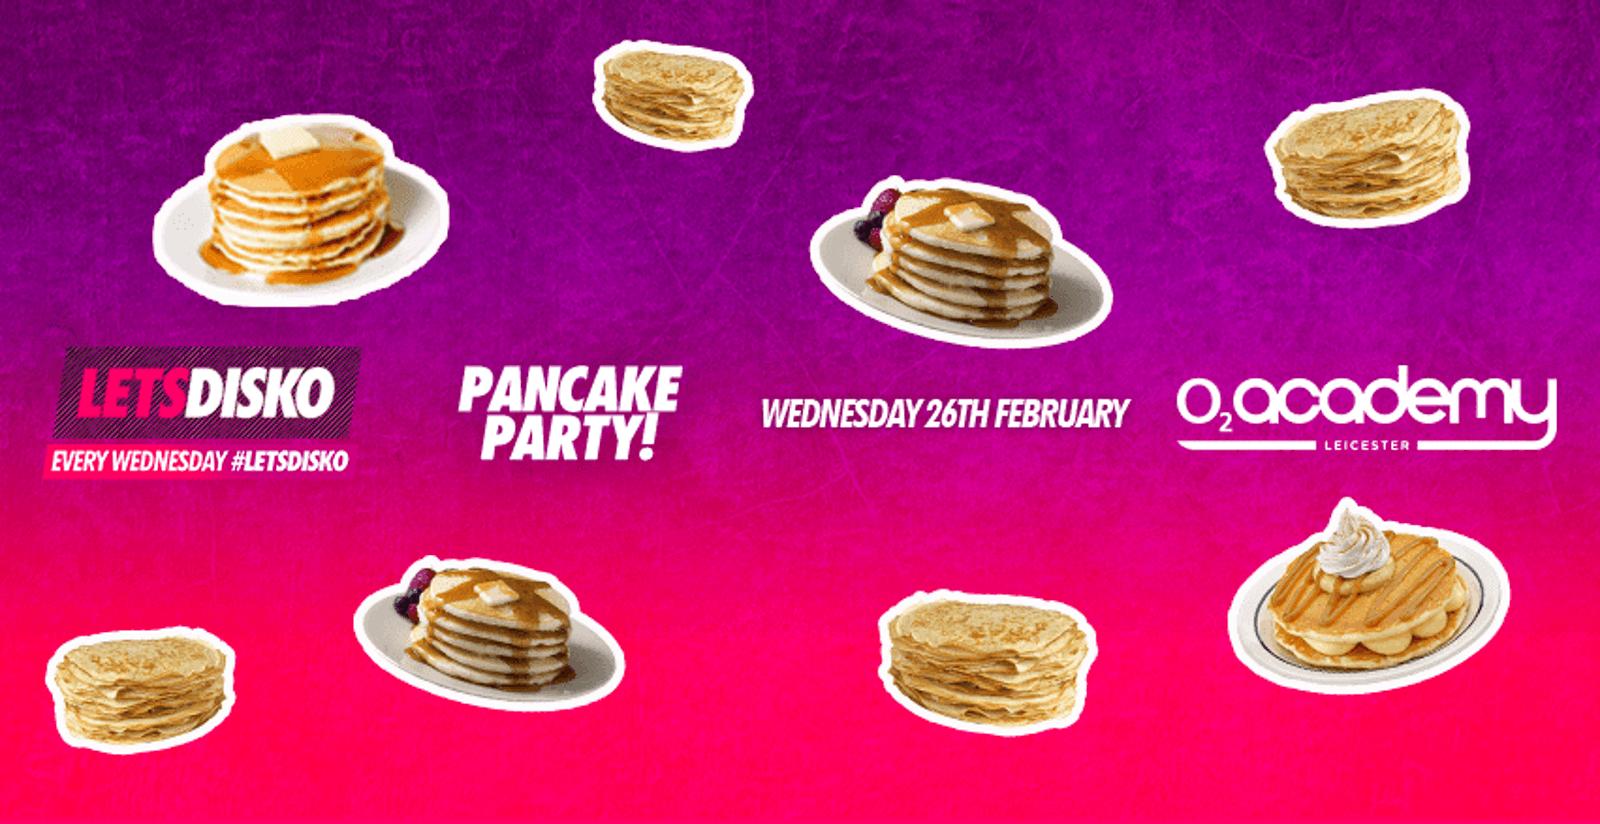 LetsDisko Pancake Party! Wednesday 26th February